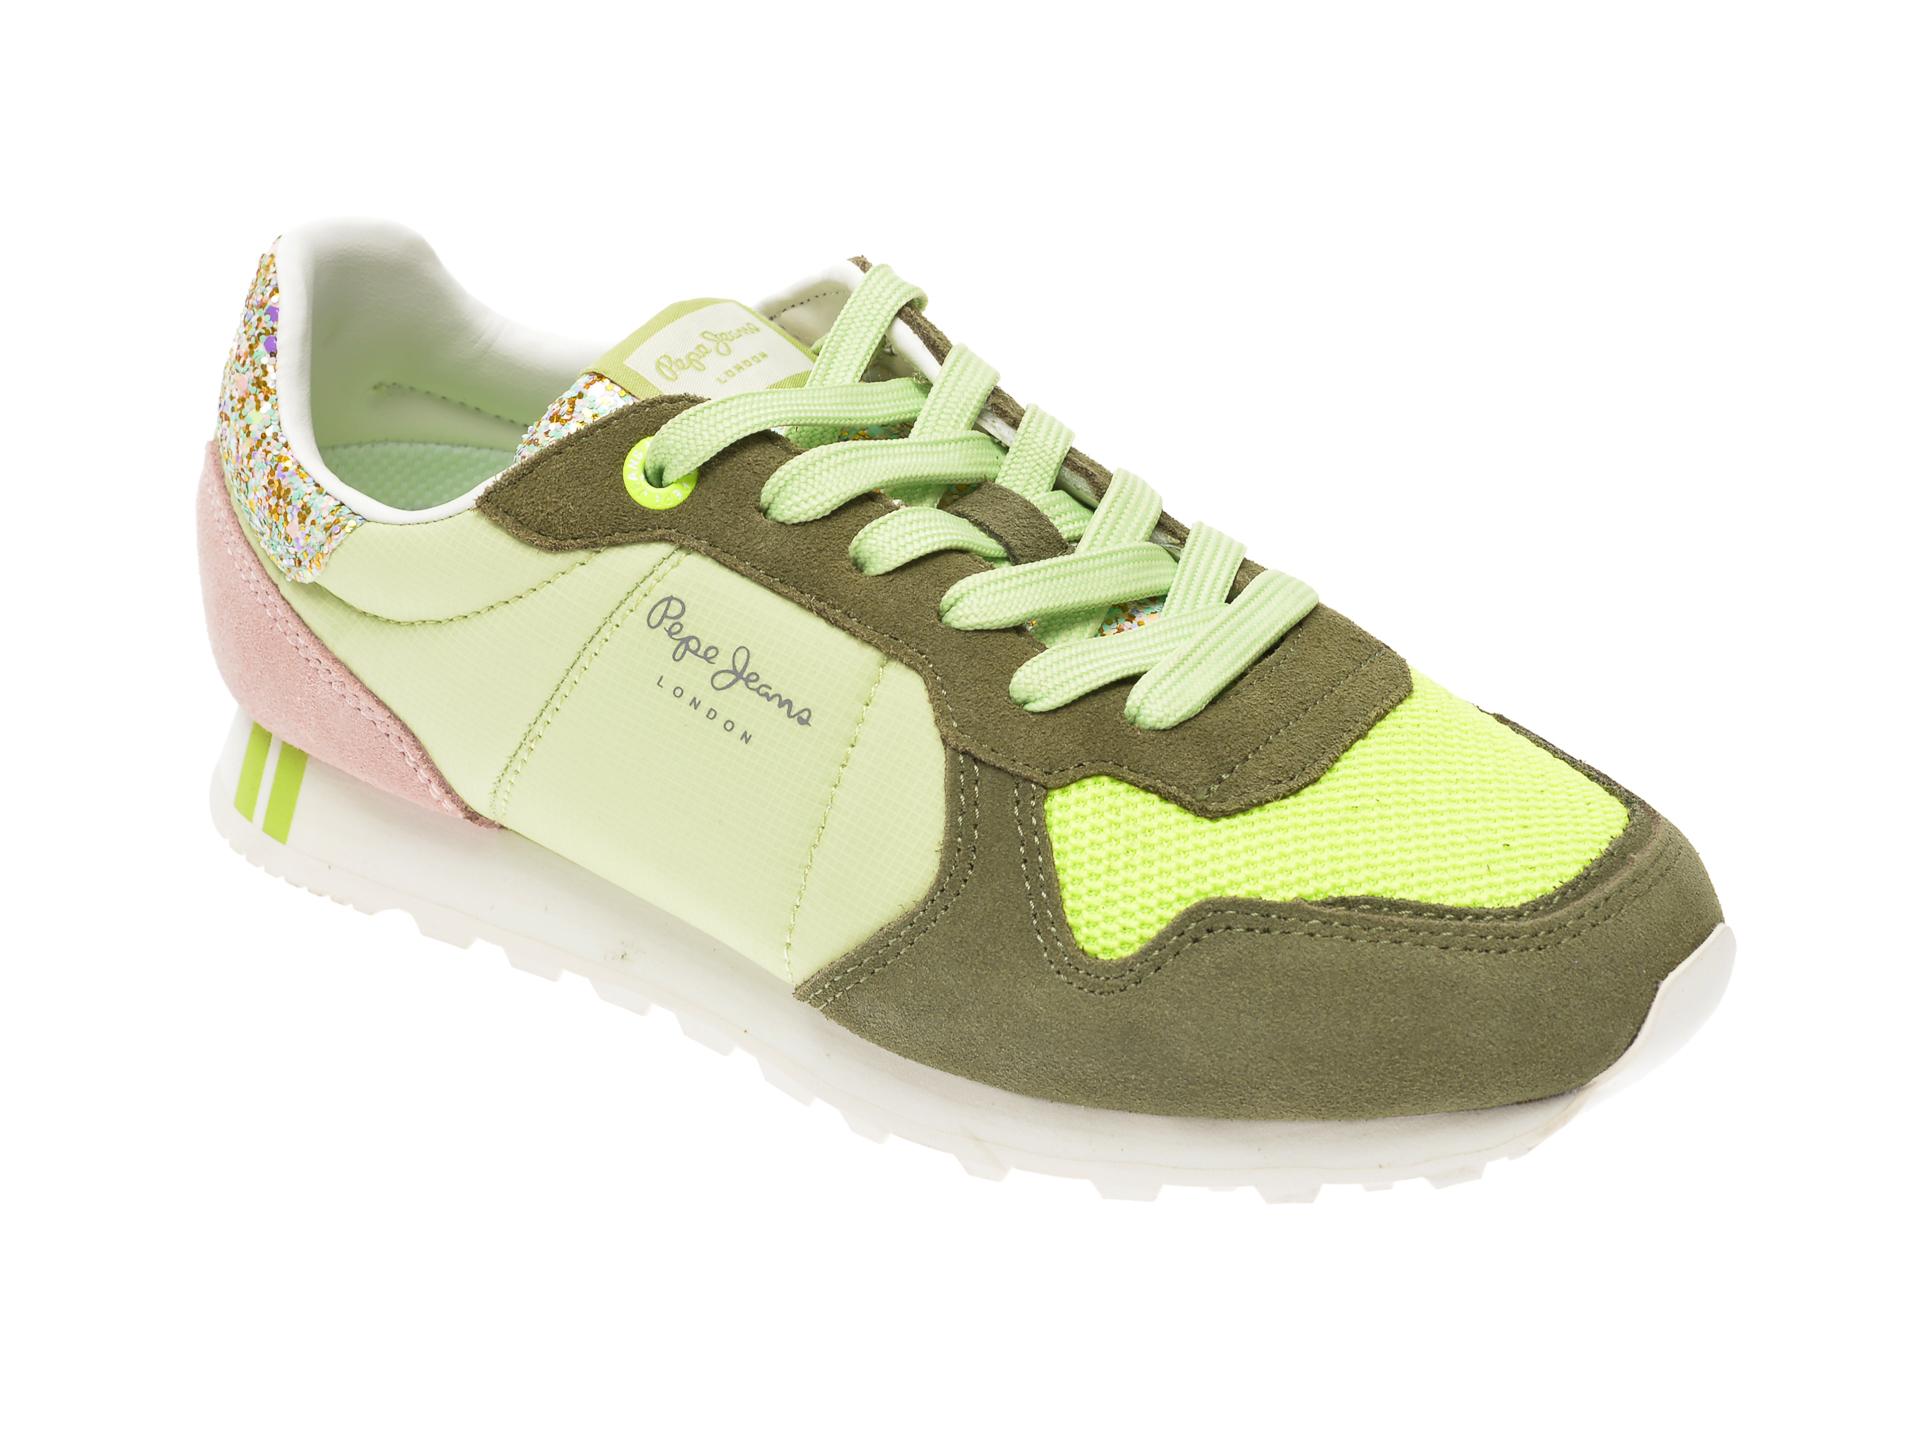 Pantofi PEPE JEANS verzi, LS31006, din material textil si piele intoarsa imagine